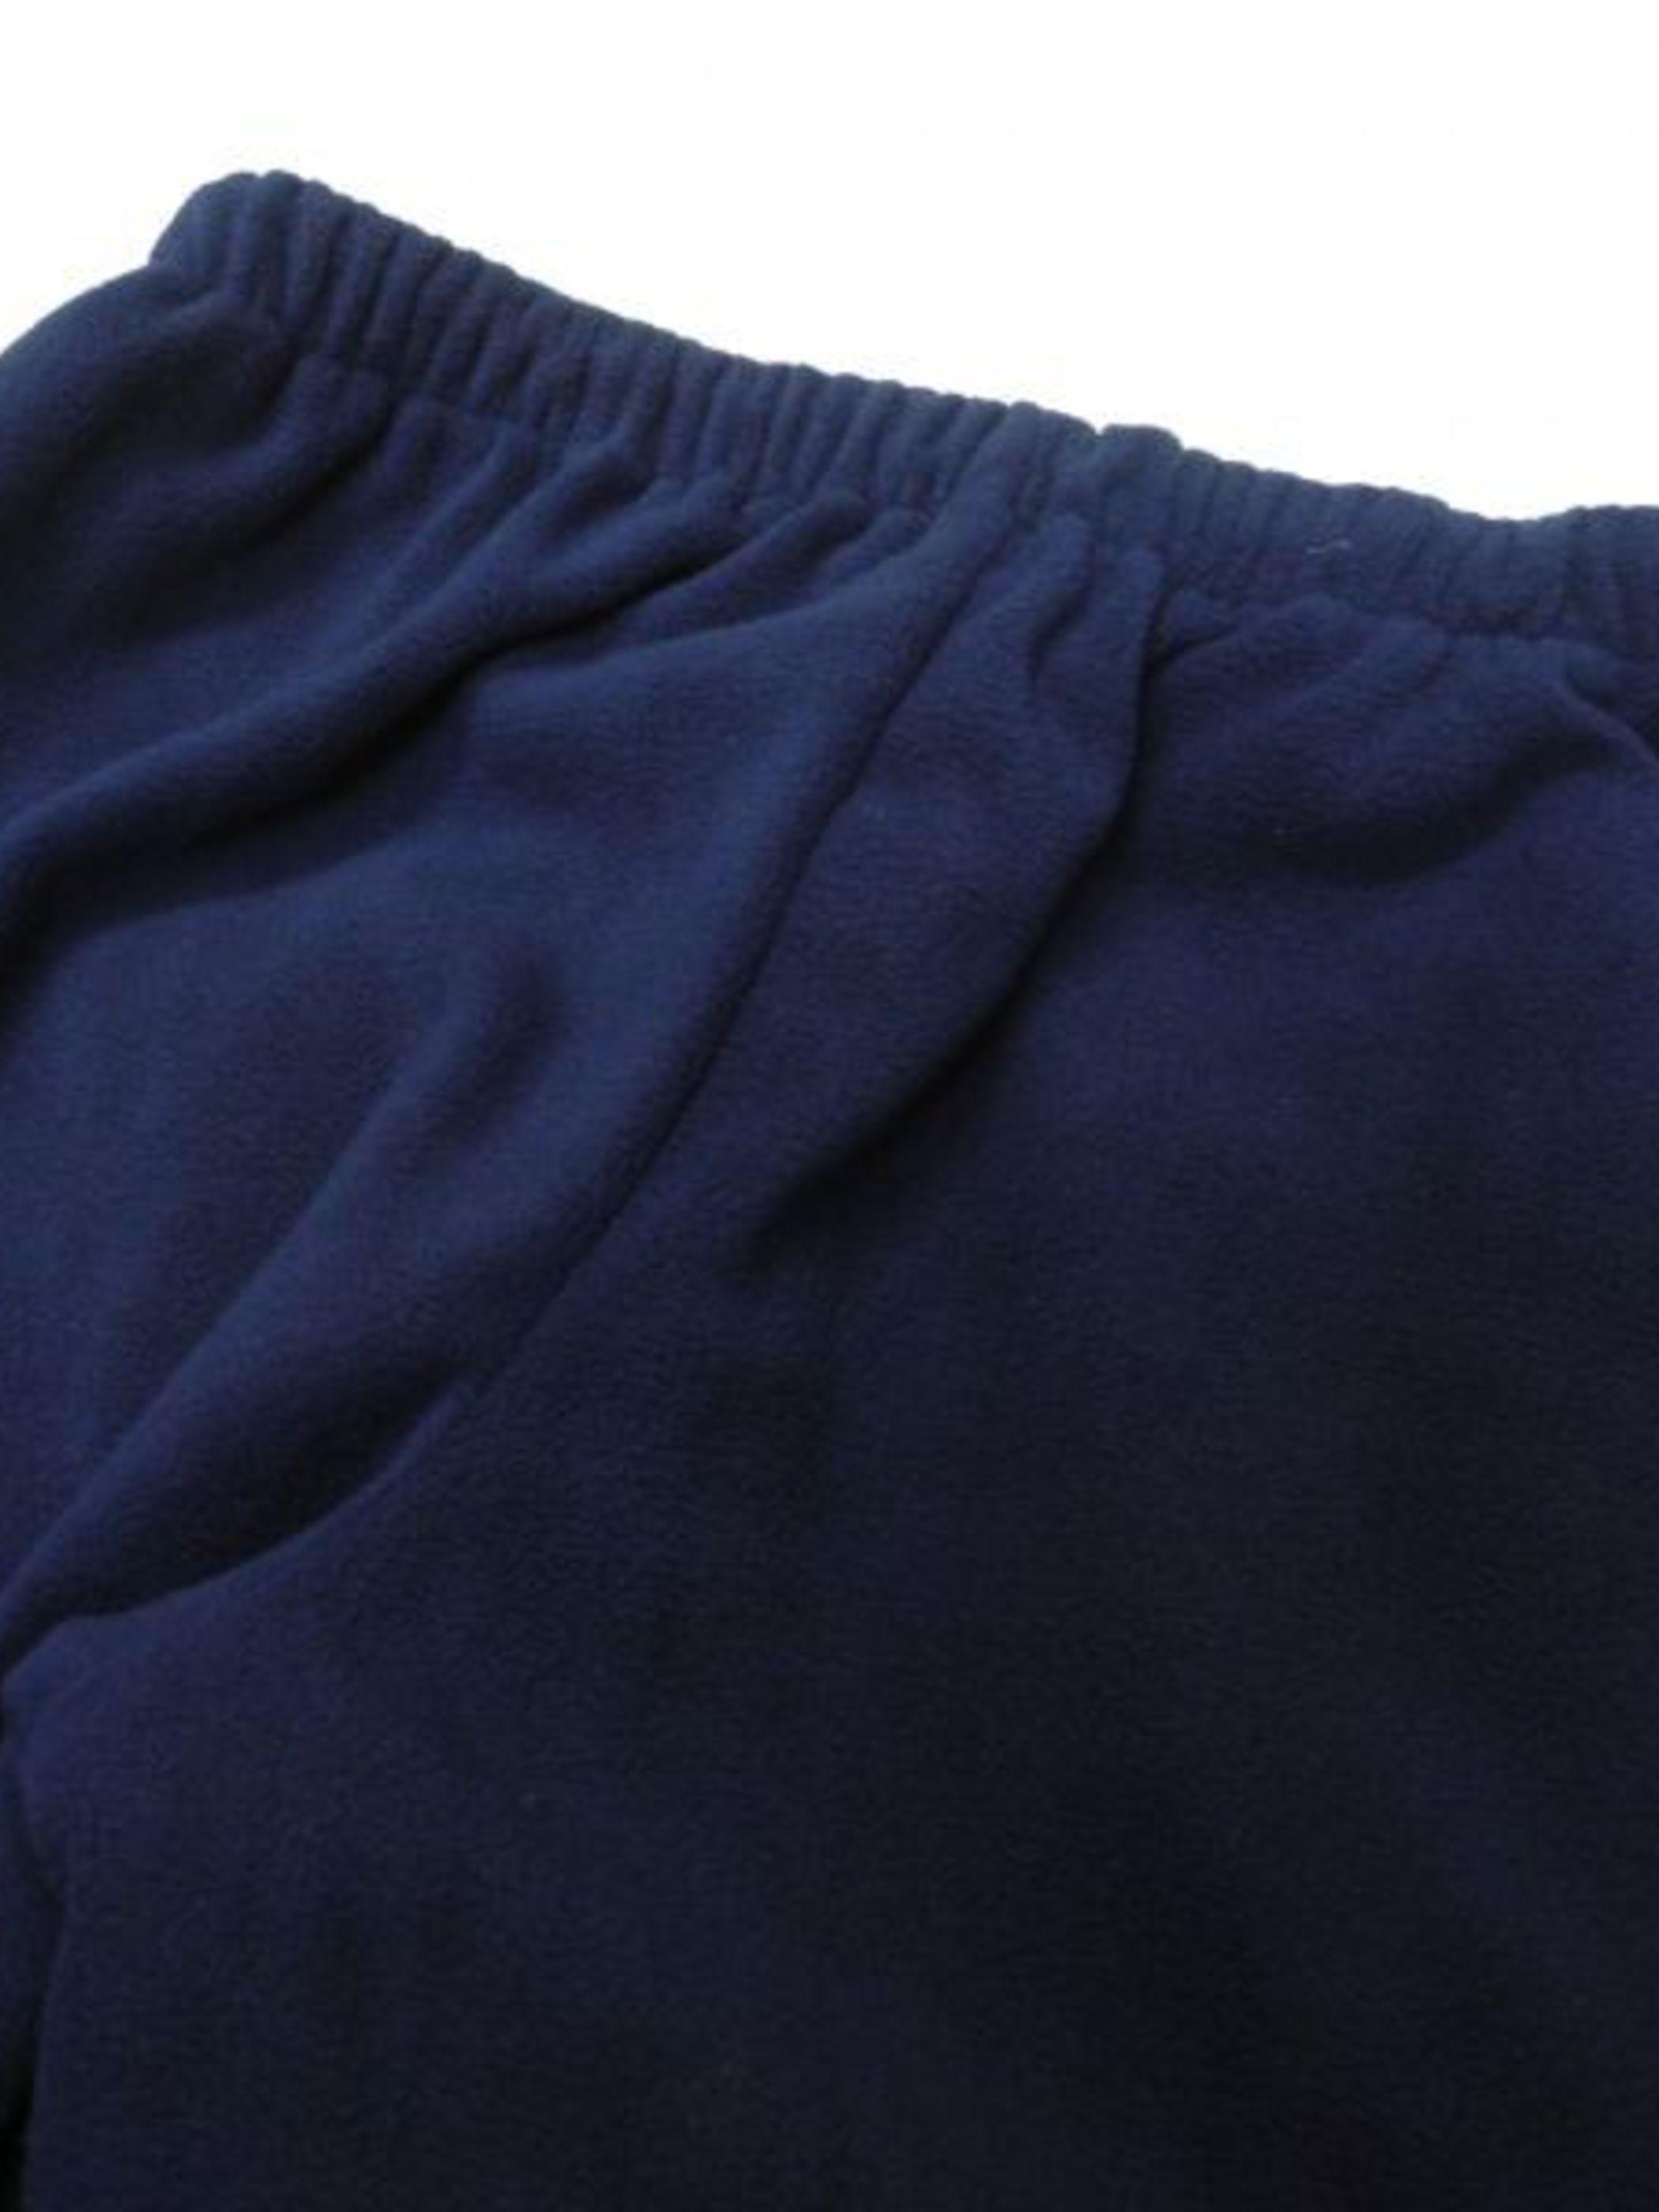 Samco Freezerwear FLEECE×CORDURA PANTS NAVY